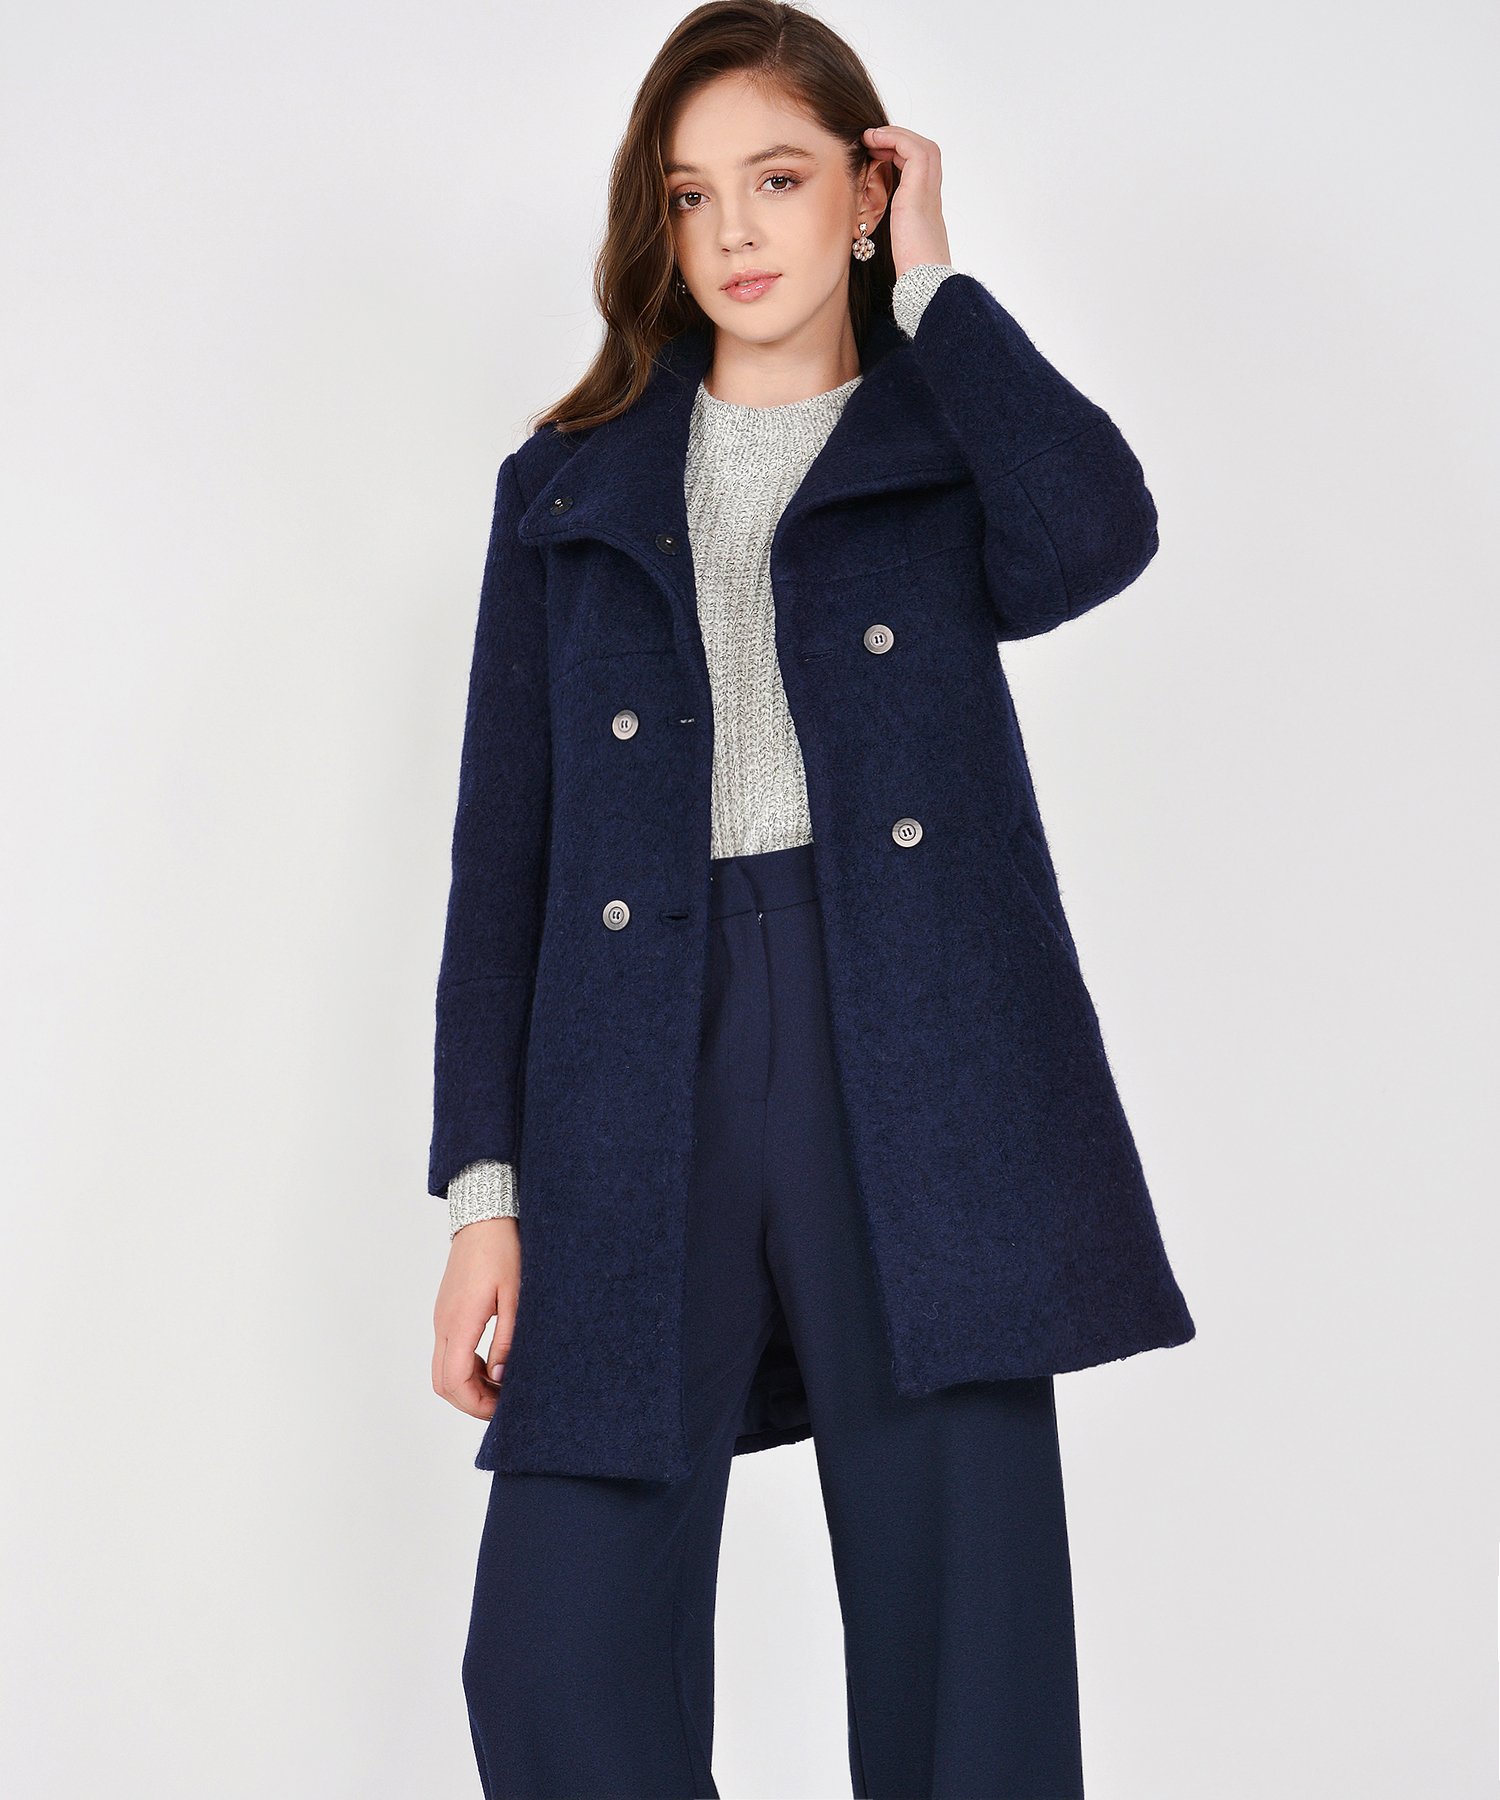 0ae40647c84e Aurora Classic Wool Coat - Navy